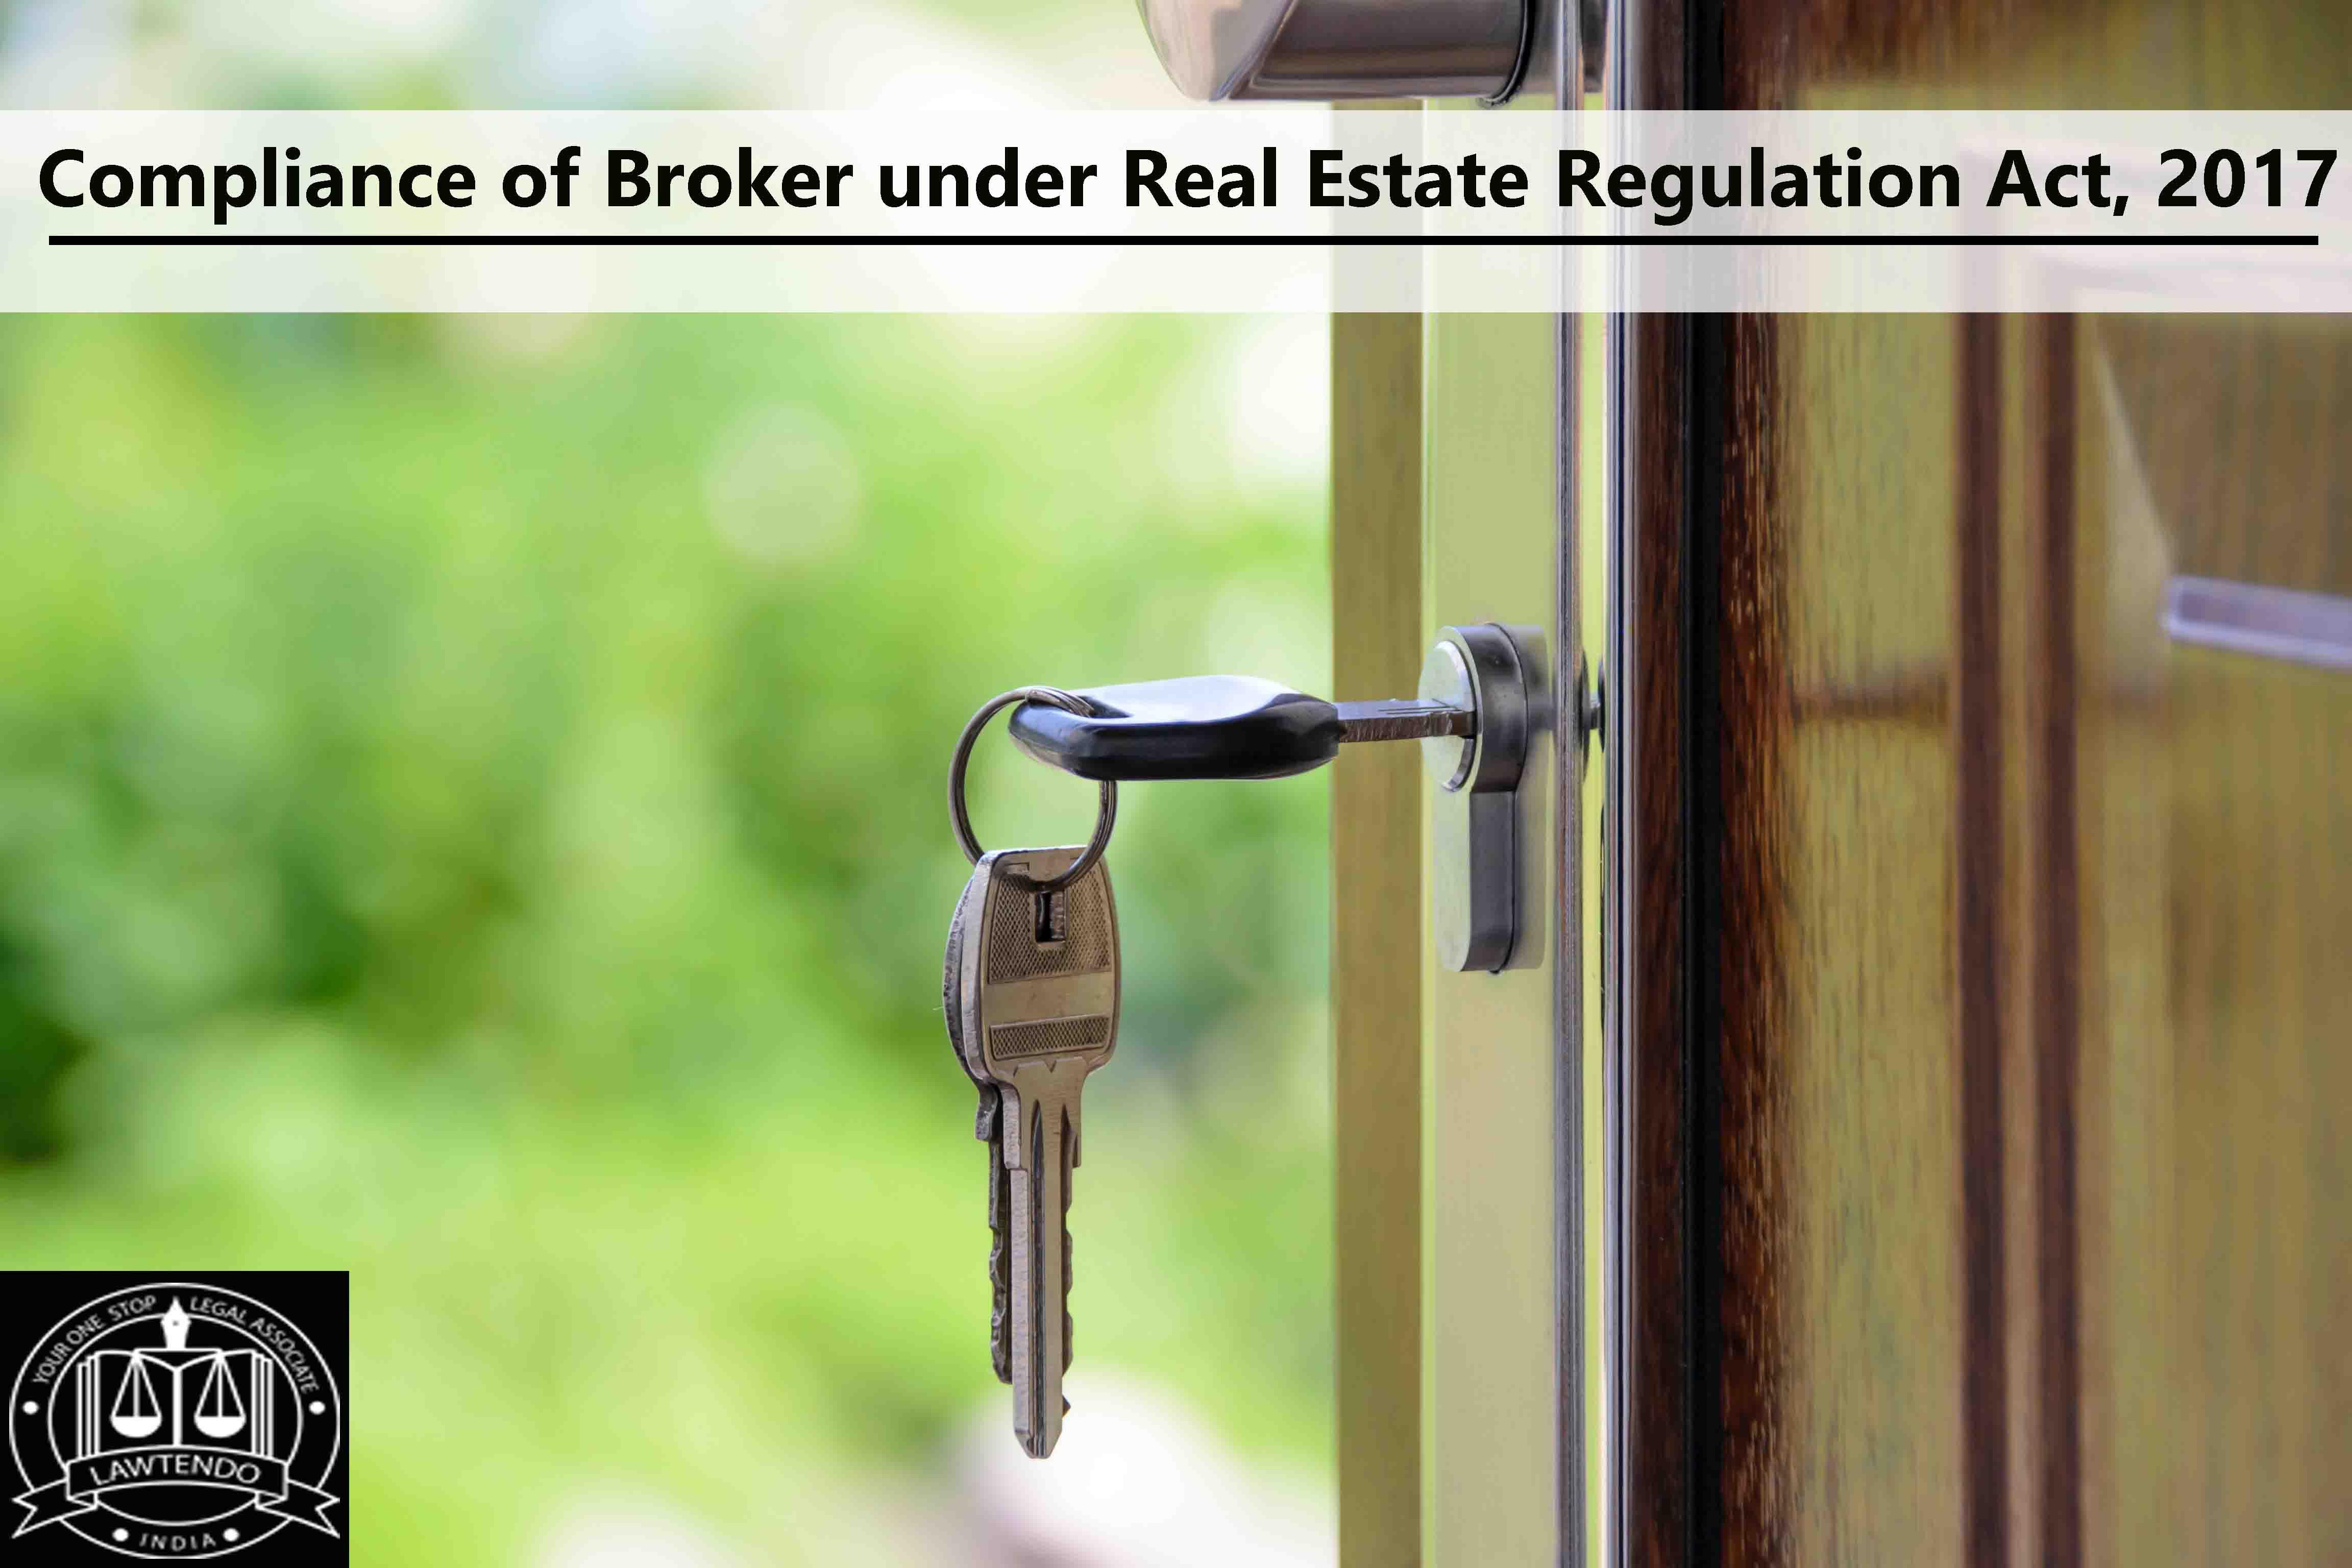 Compliance Of Broker Under Real Estate Regulation Act, 2017